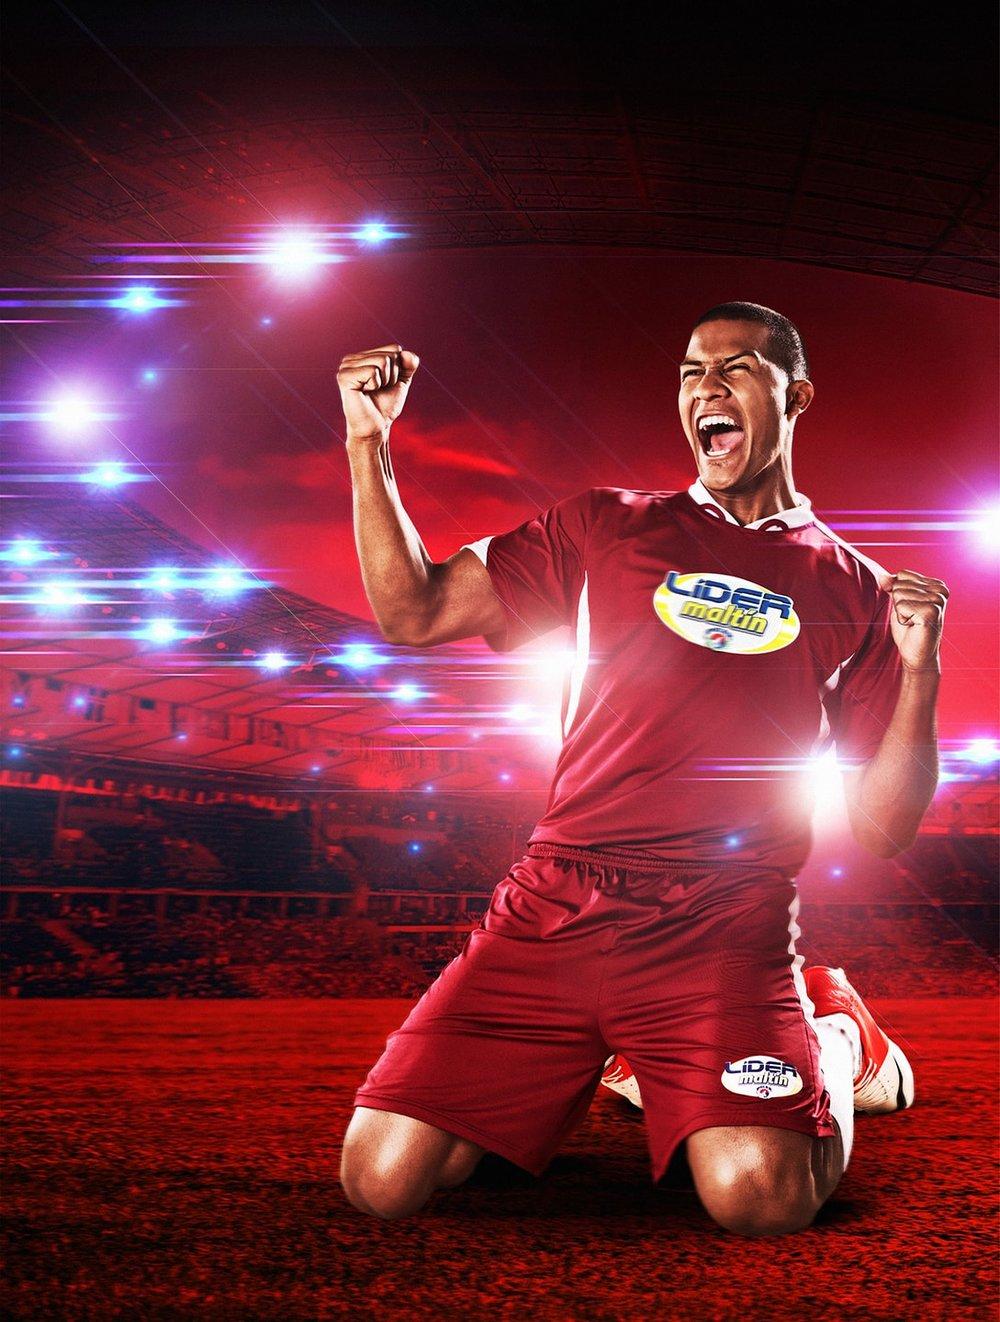 soccer-sports-photography-miami-marcel-boldu.jpg